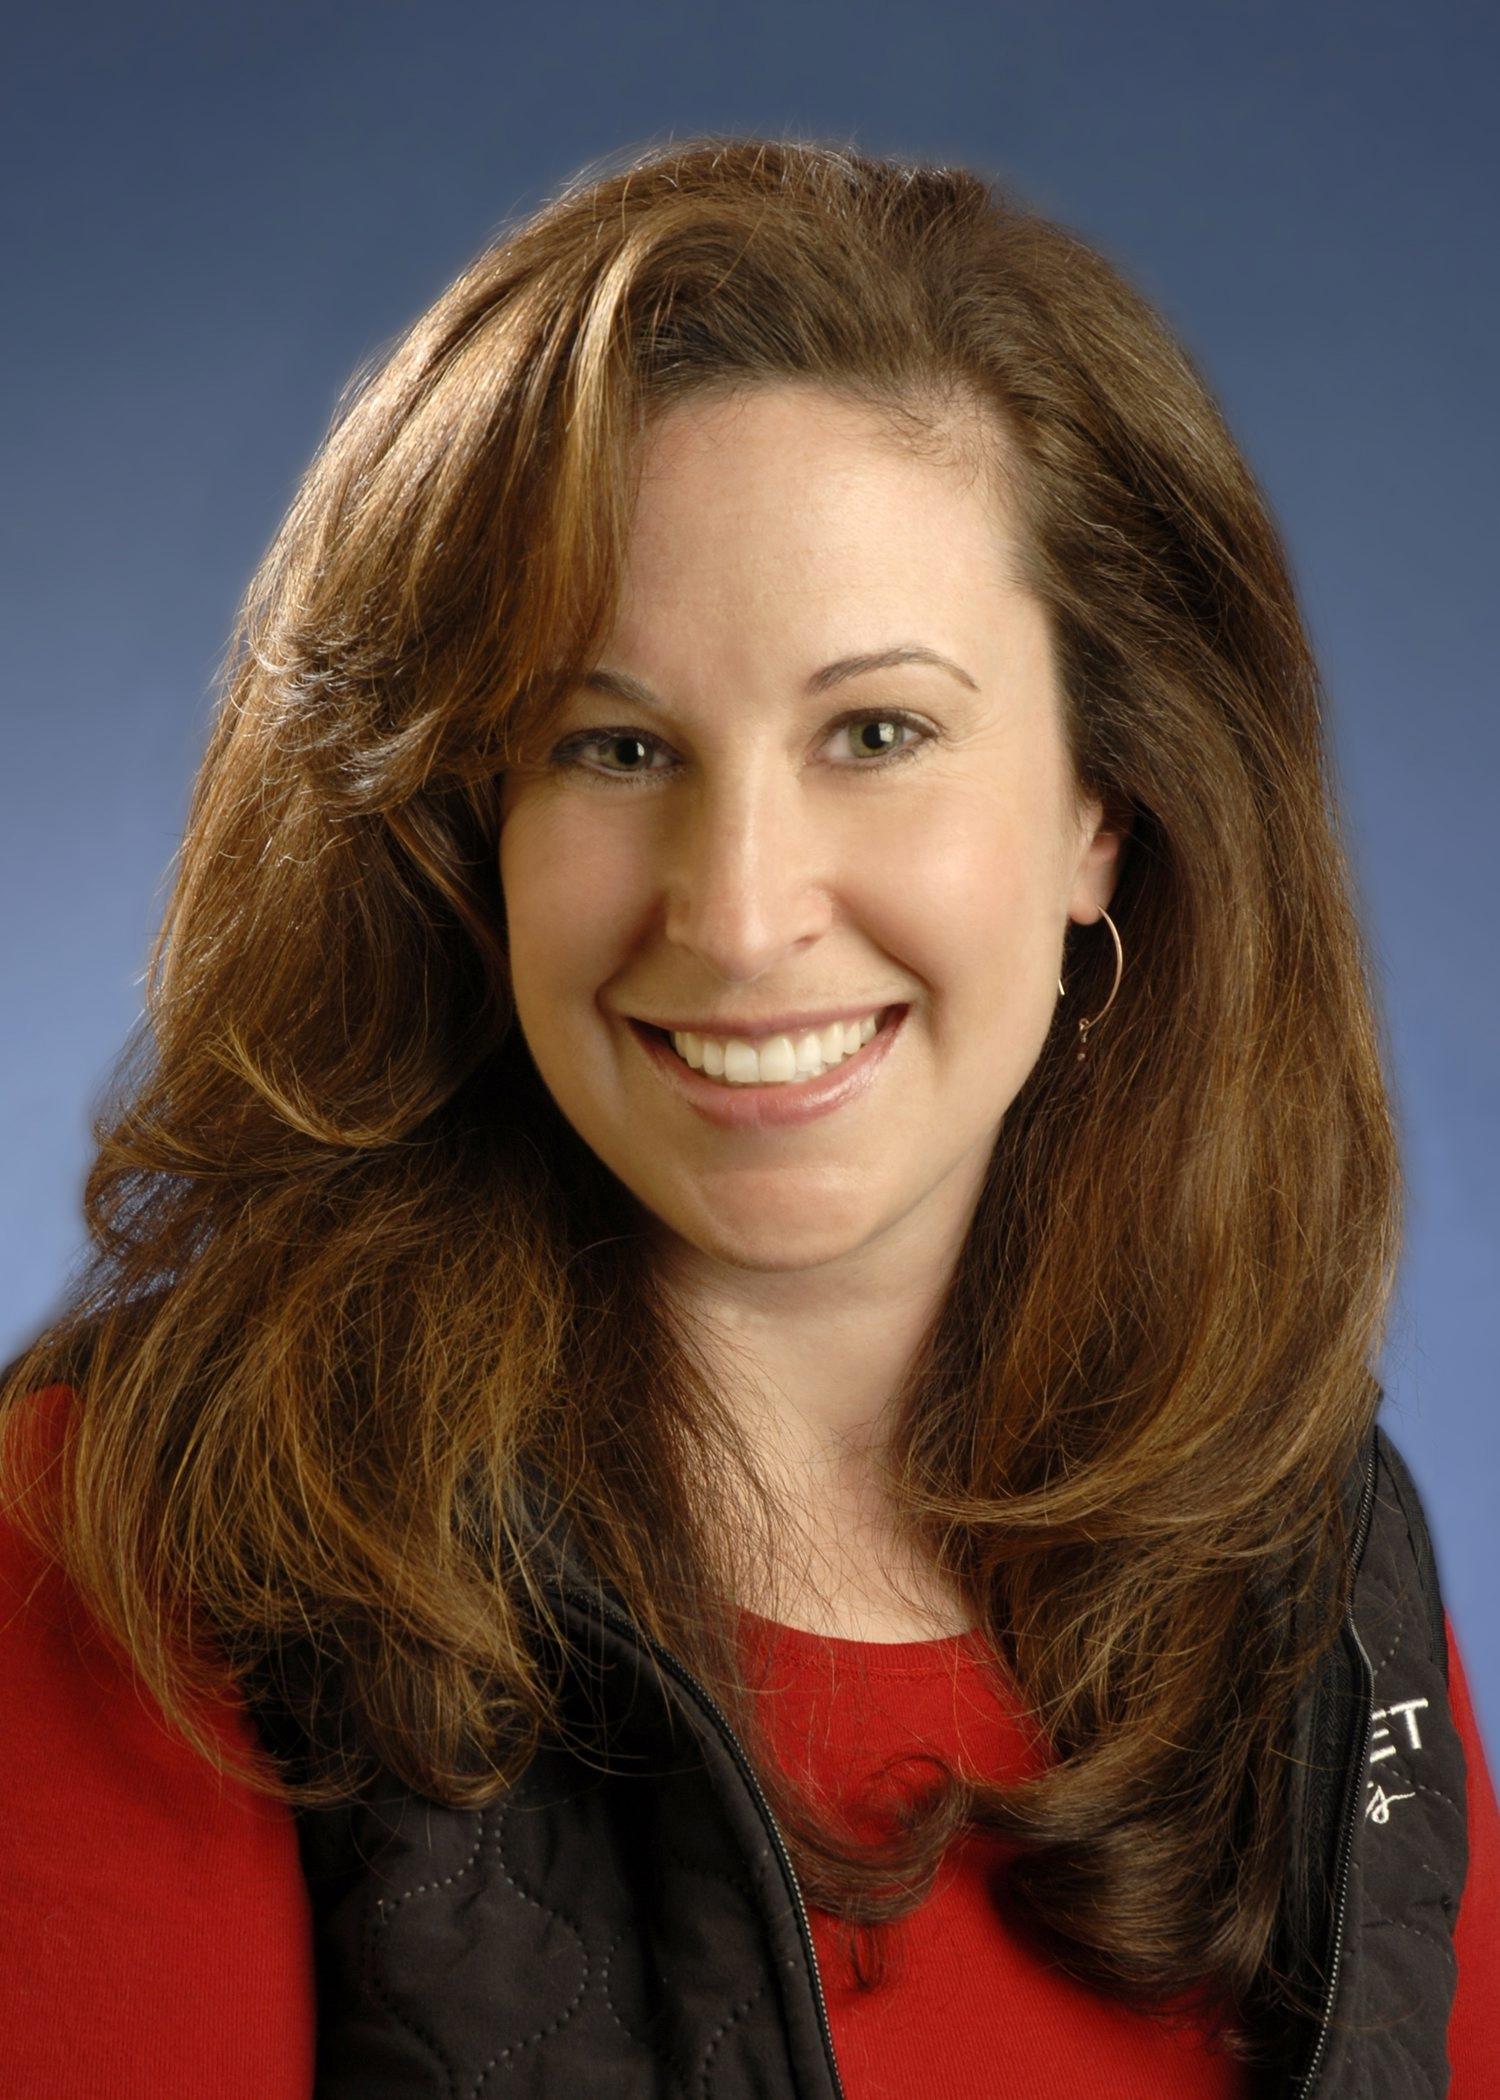 Ellen Brenner of Fleet Feet Sports has big plans for the Buffalo race scene, including winter events.